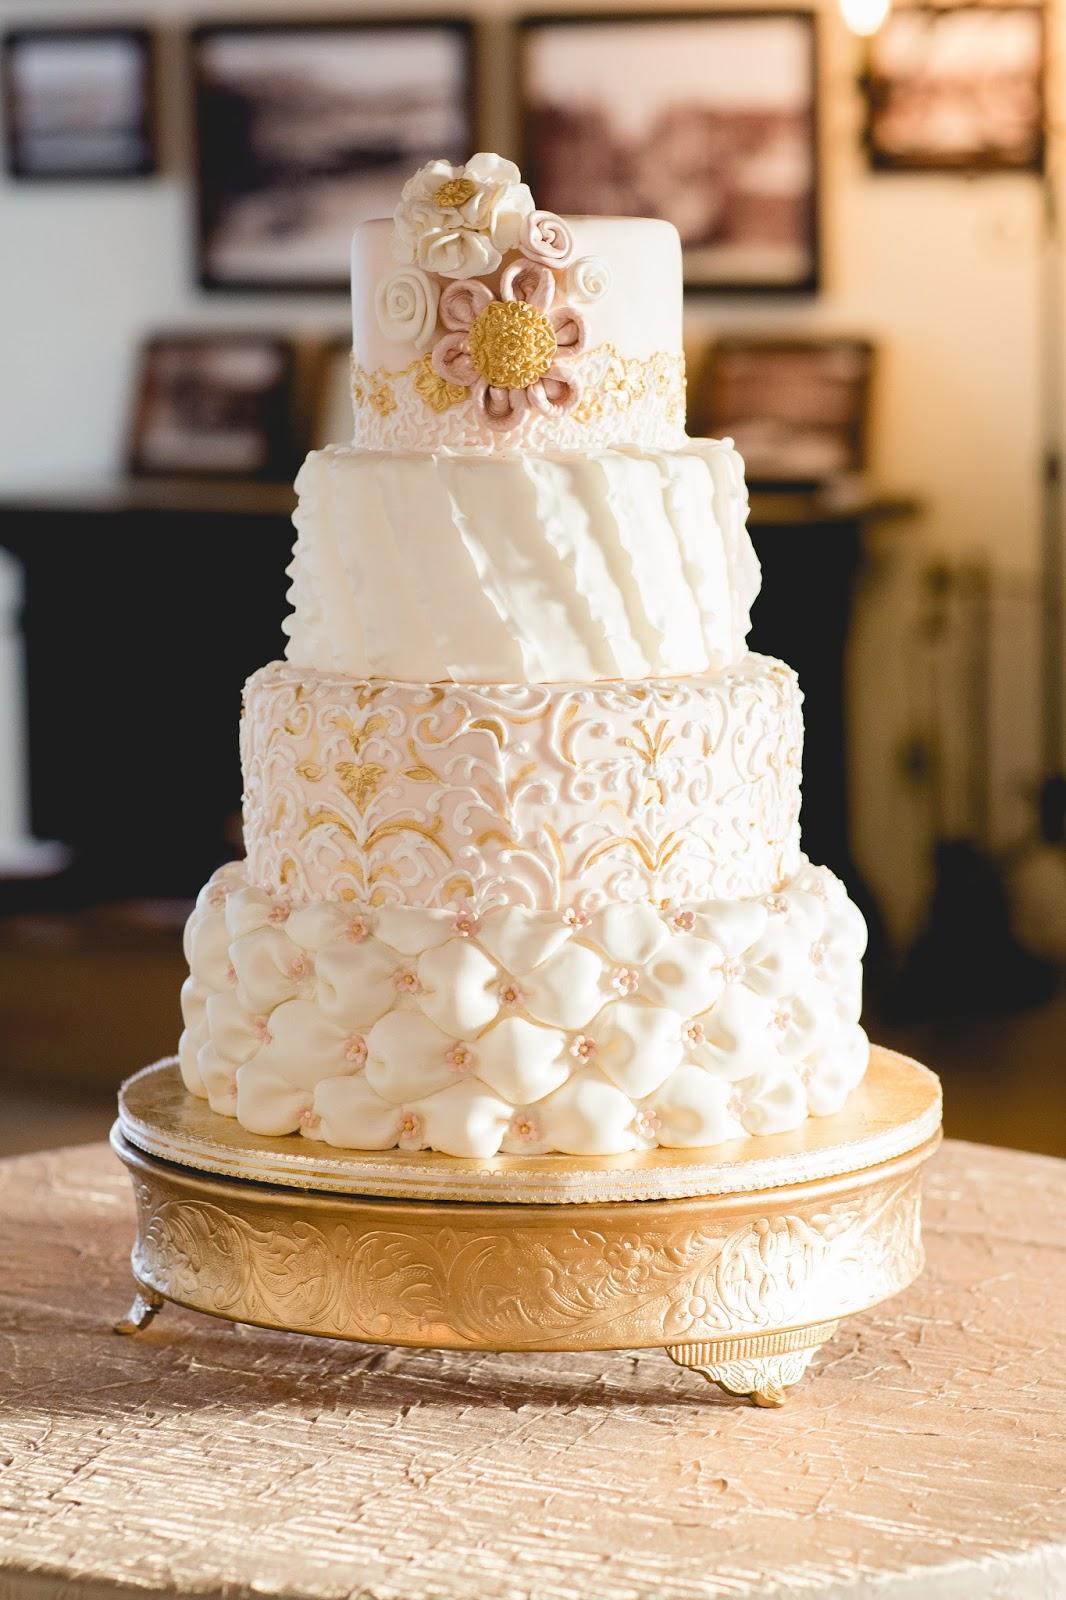 Wedding Cake Pops 72 Vintage The small bites dessert